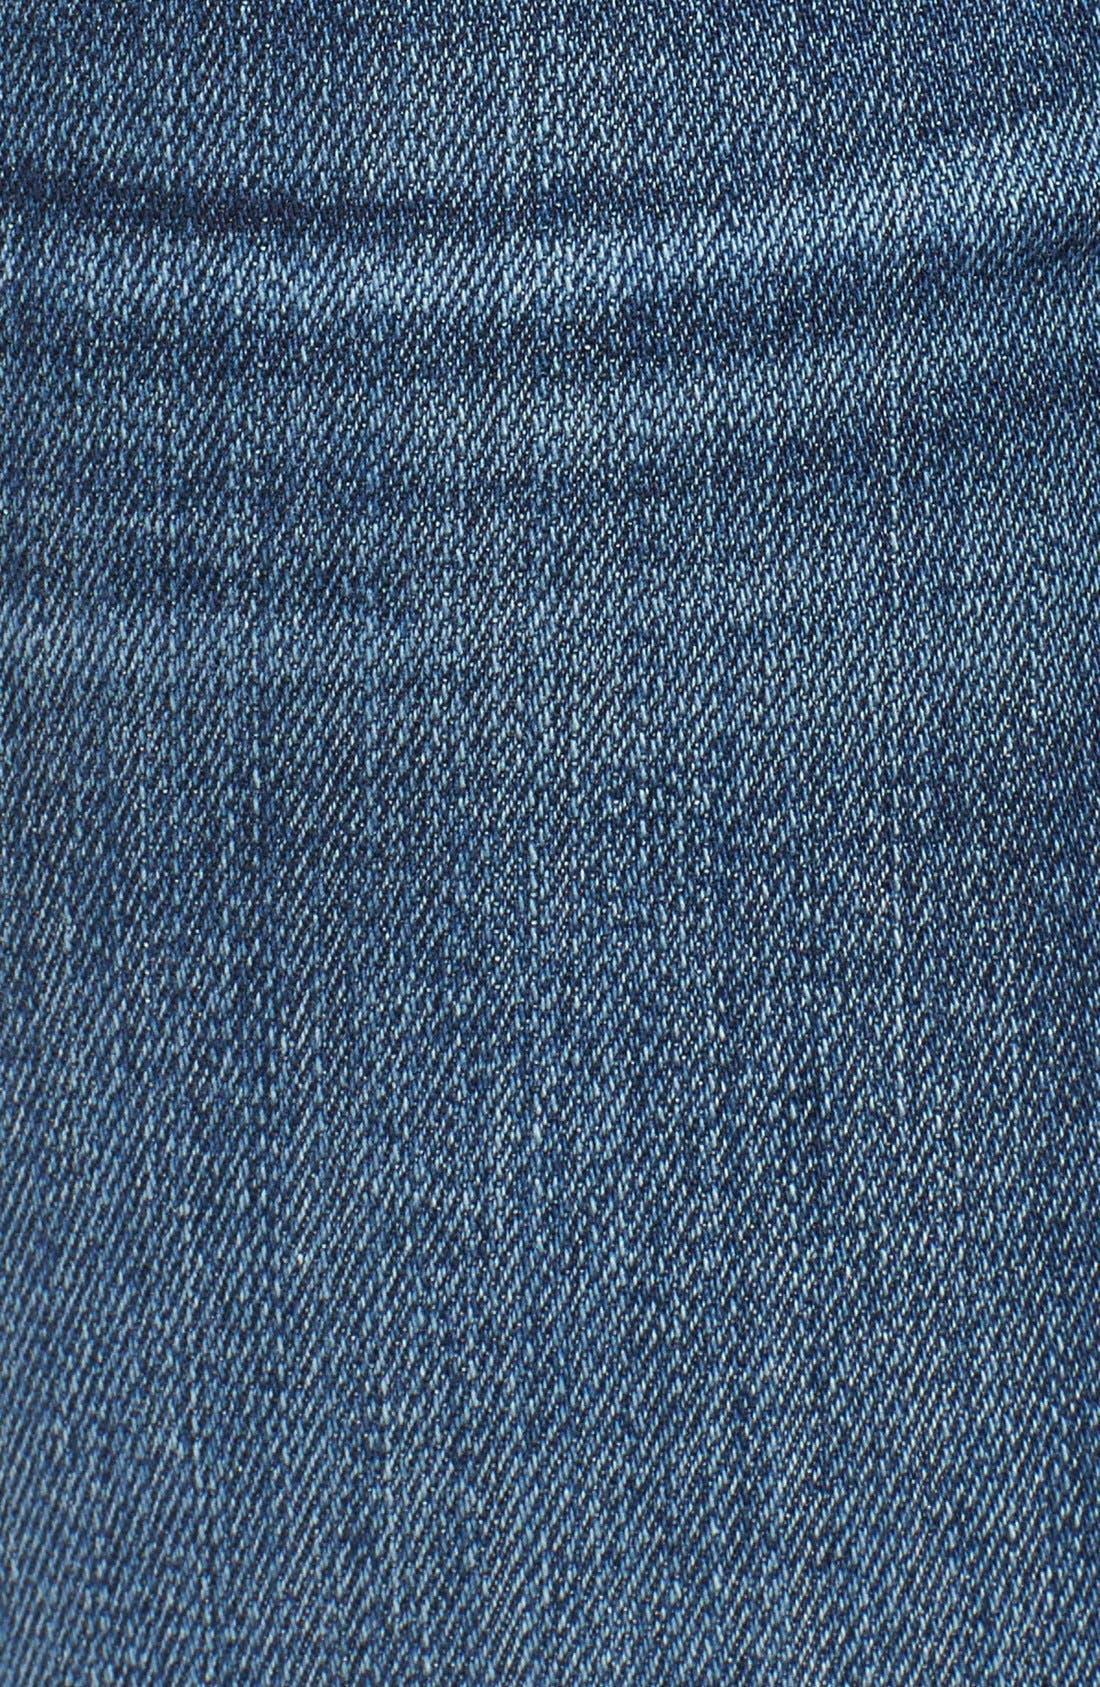 Alternate Image 5  - DL1961 'Florence' Skinny Jeans (Athena)